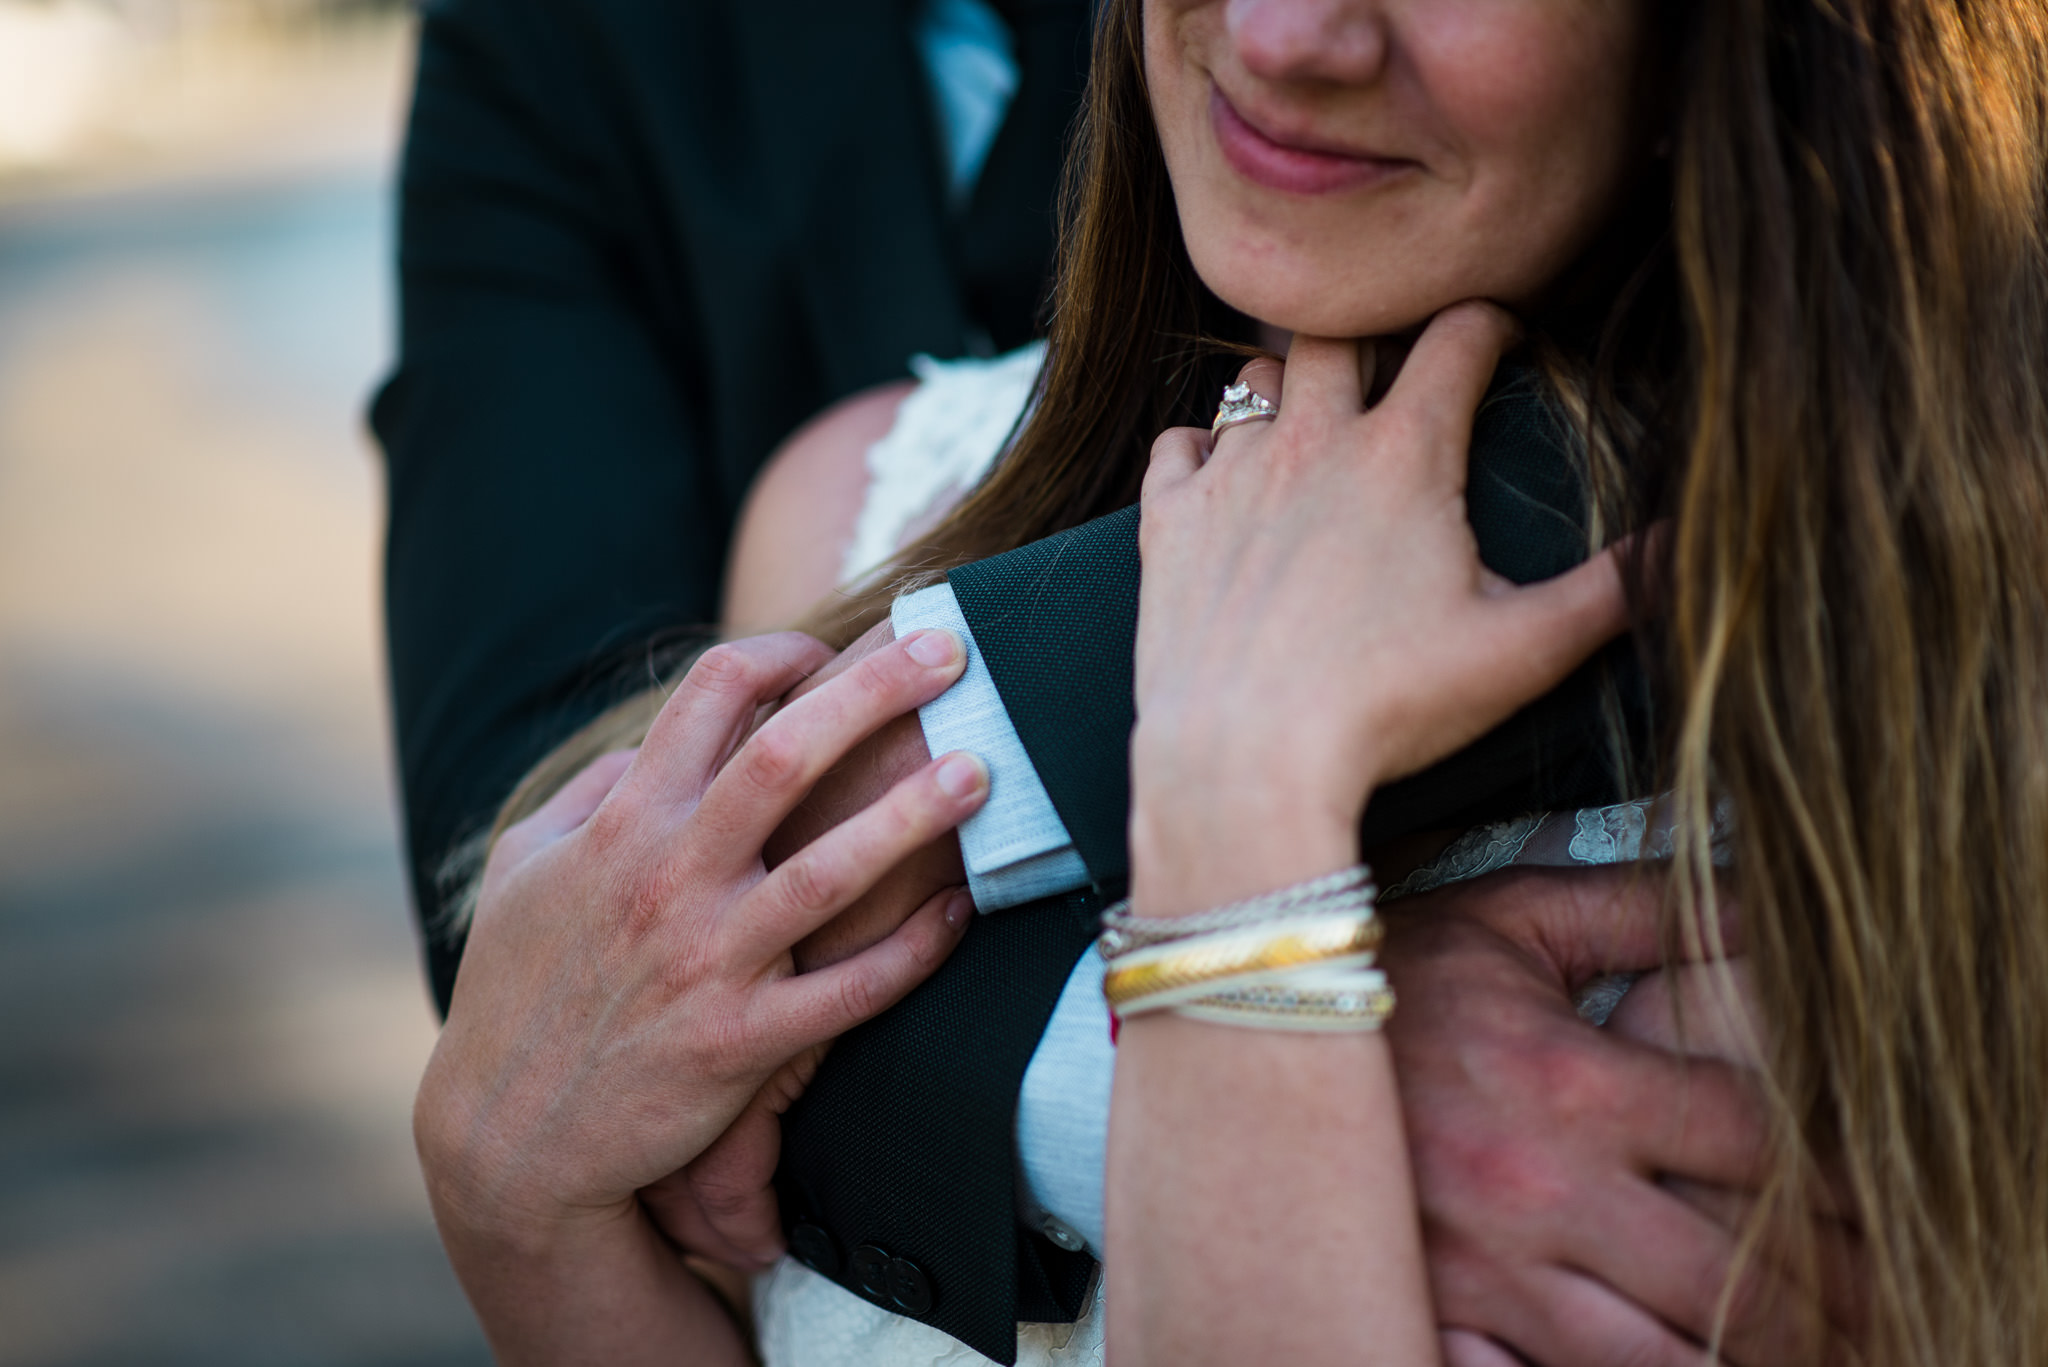 Melanie-Matt-Pitt-Lake-Post-Wedding-Shoot-Victoria-Wedding-Photographers-19.jpg